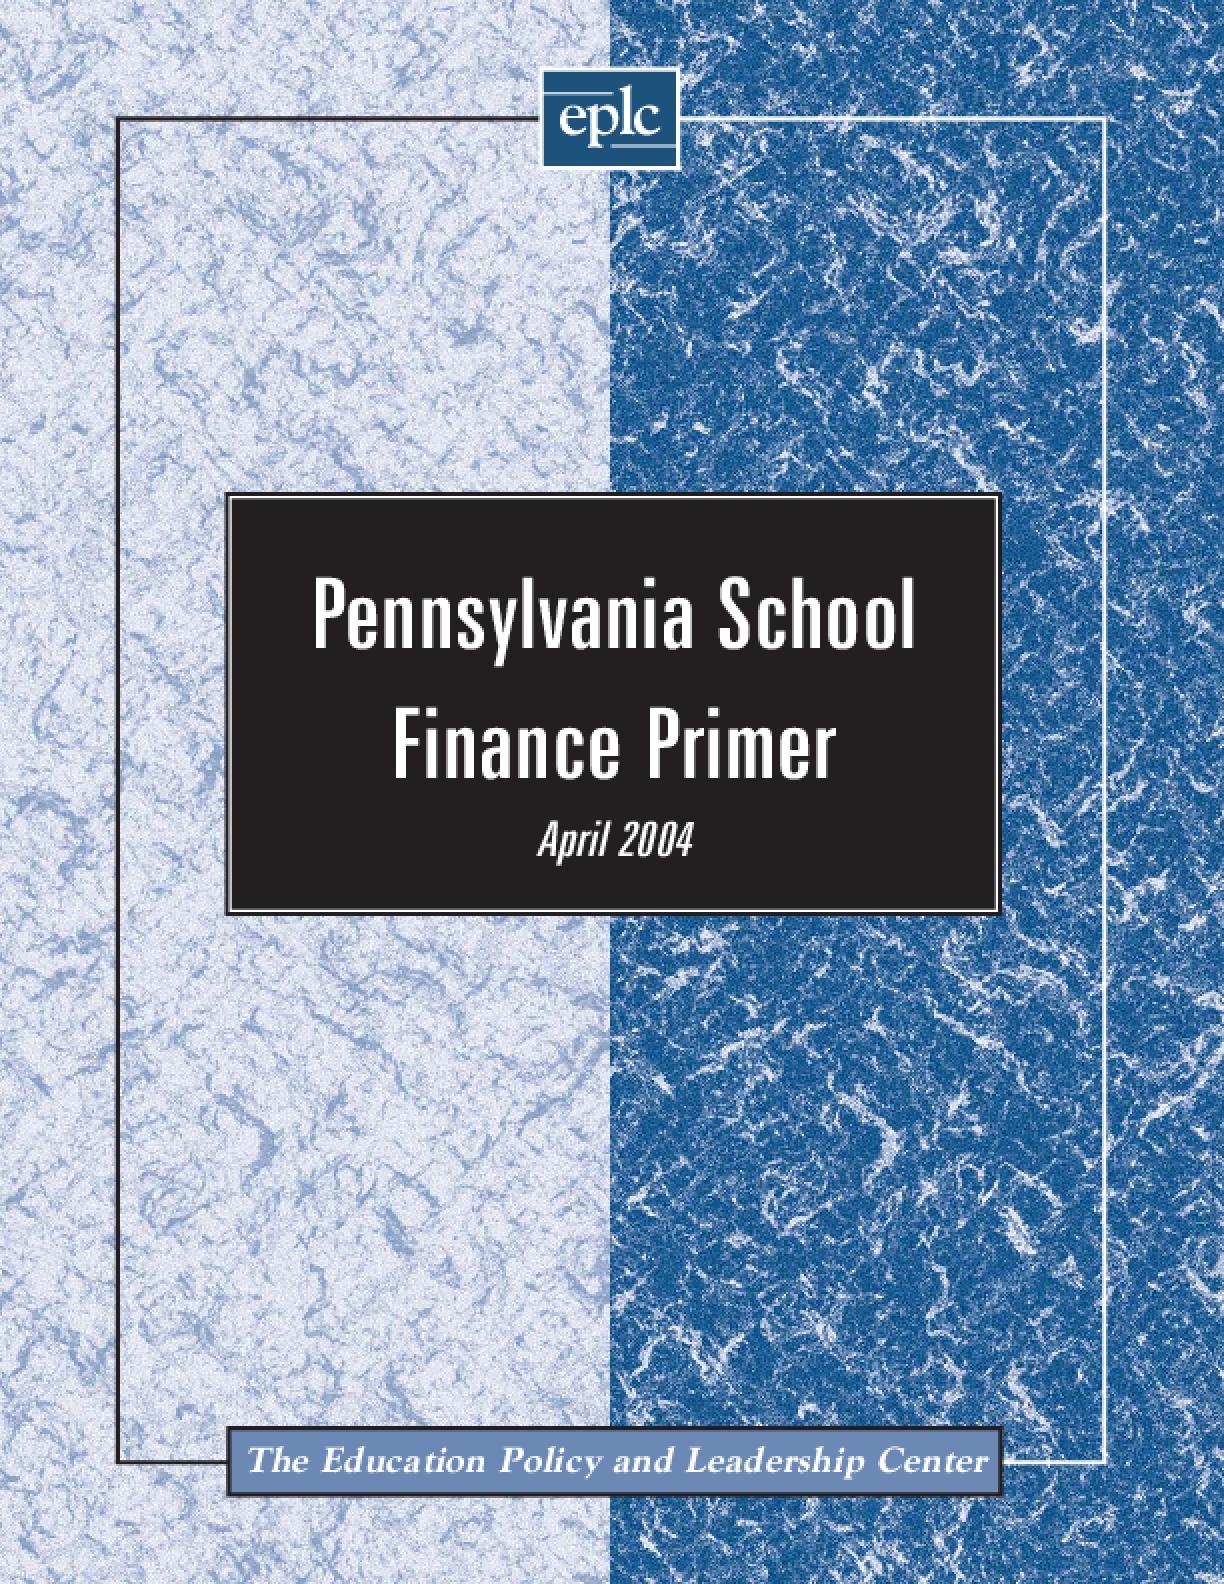 Pennsylvania School Finance Primer